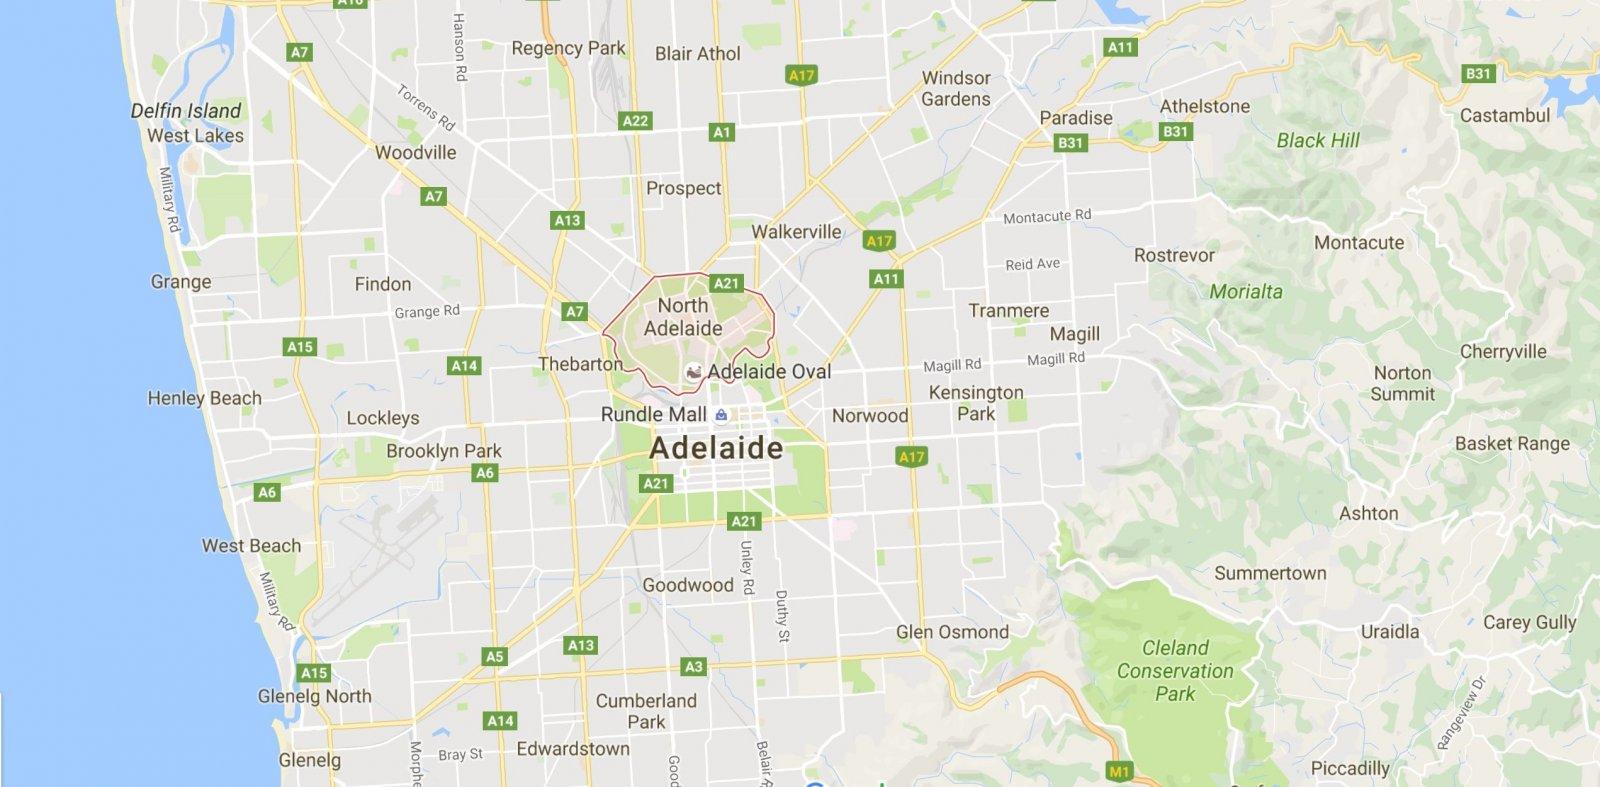 North Adelaide.jpg